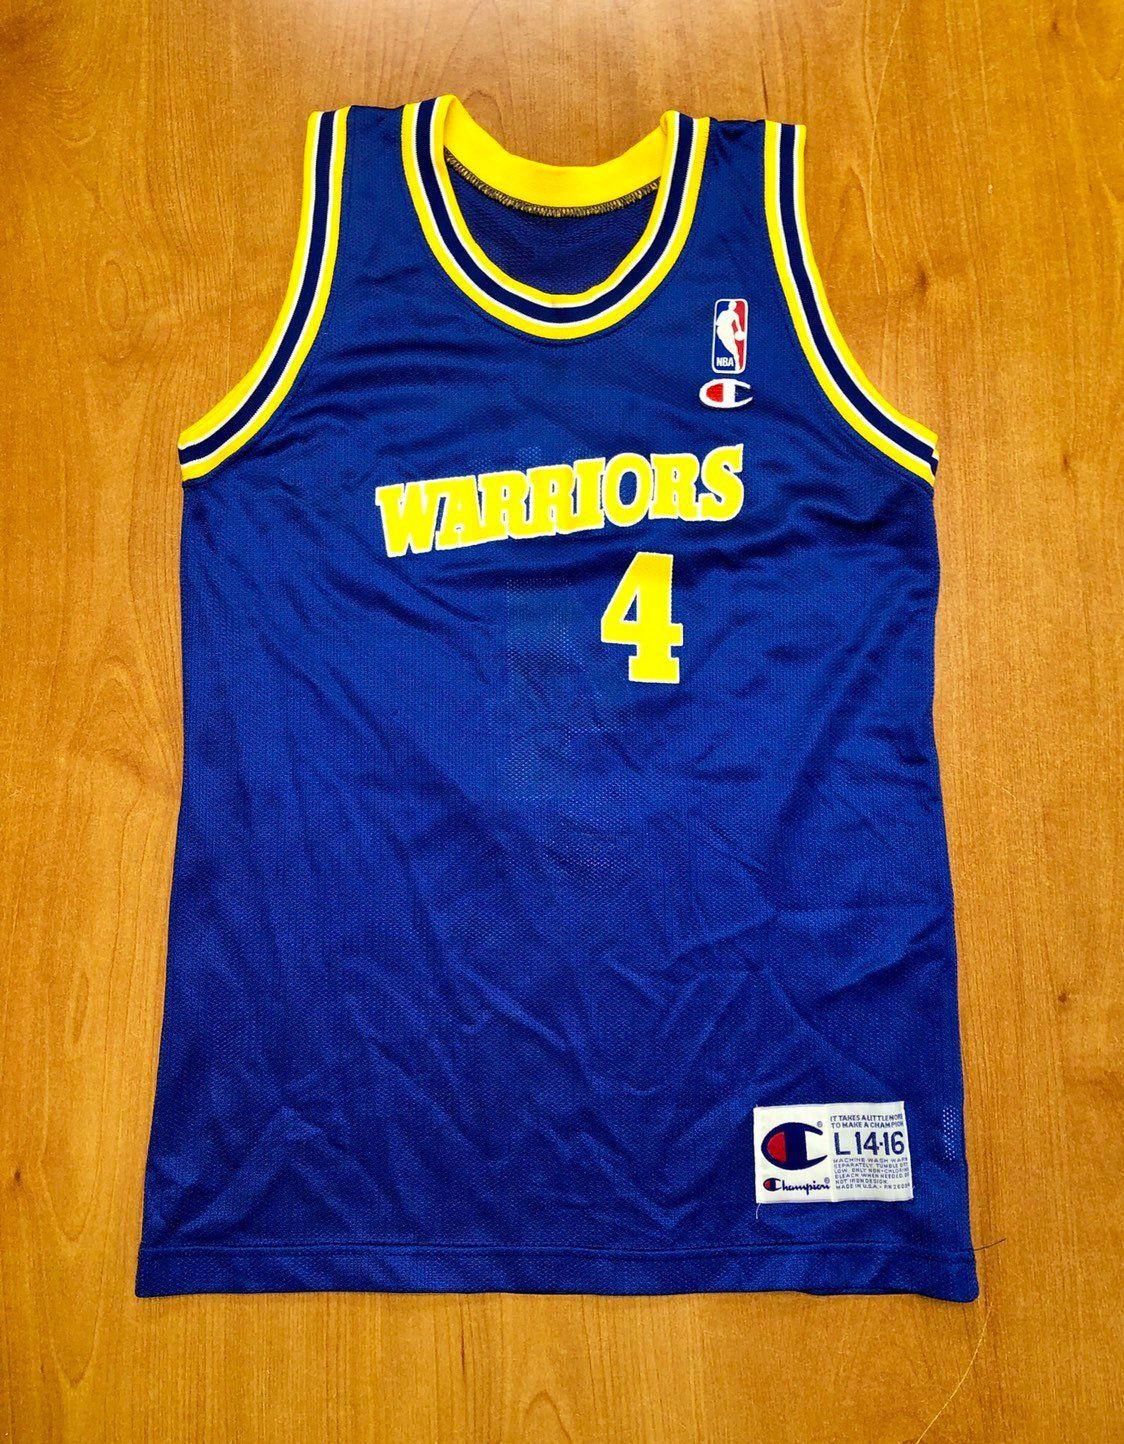 70f0e7d8 Vintage 1993 - 1994 Chris Webber Golden State Warriors Champion Jersey Size  Youth Large mitch richmond stephen jackson jason richardson kids by ...